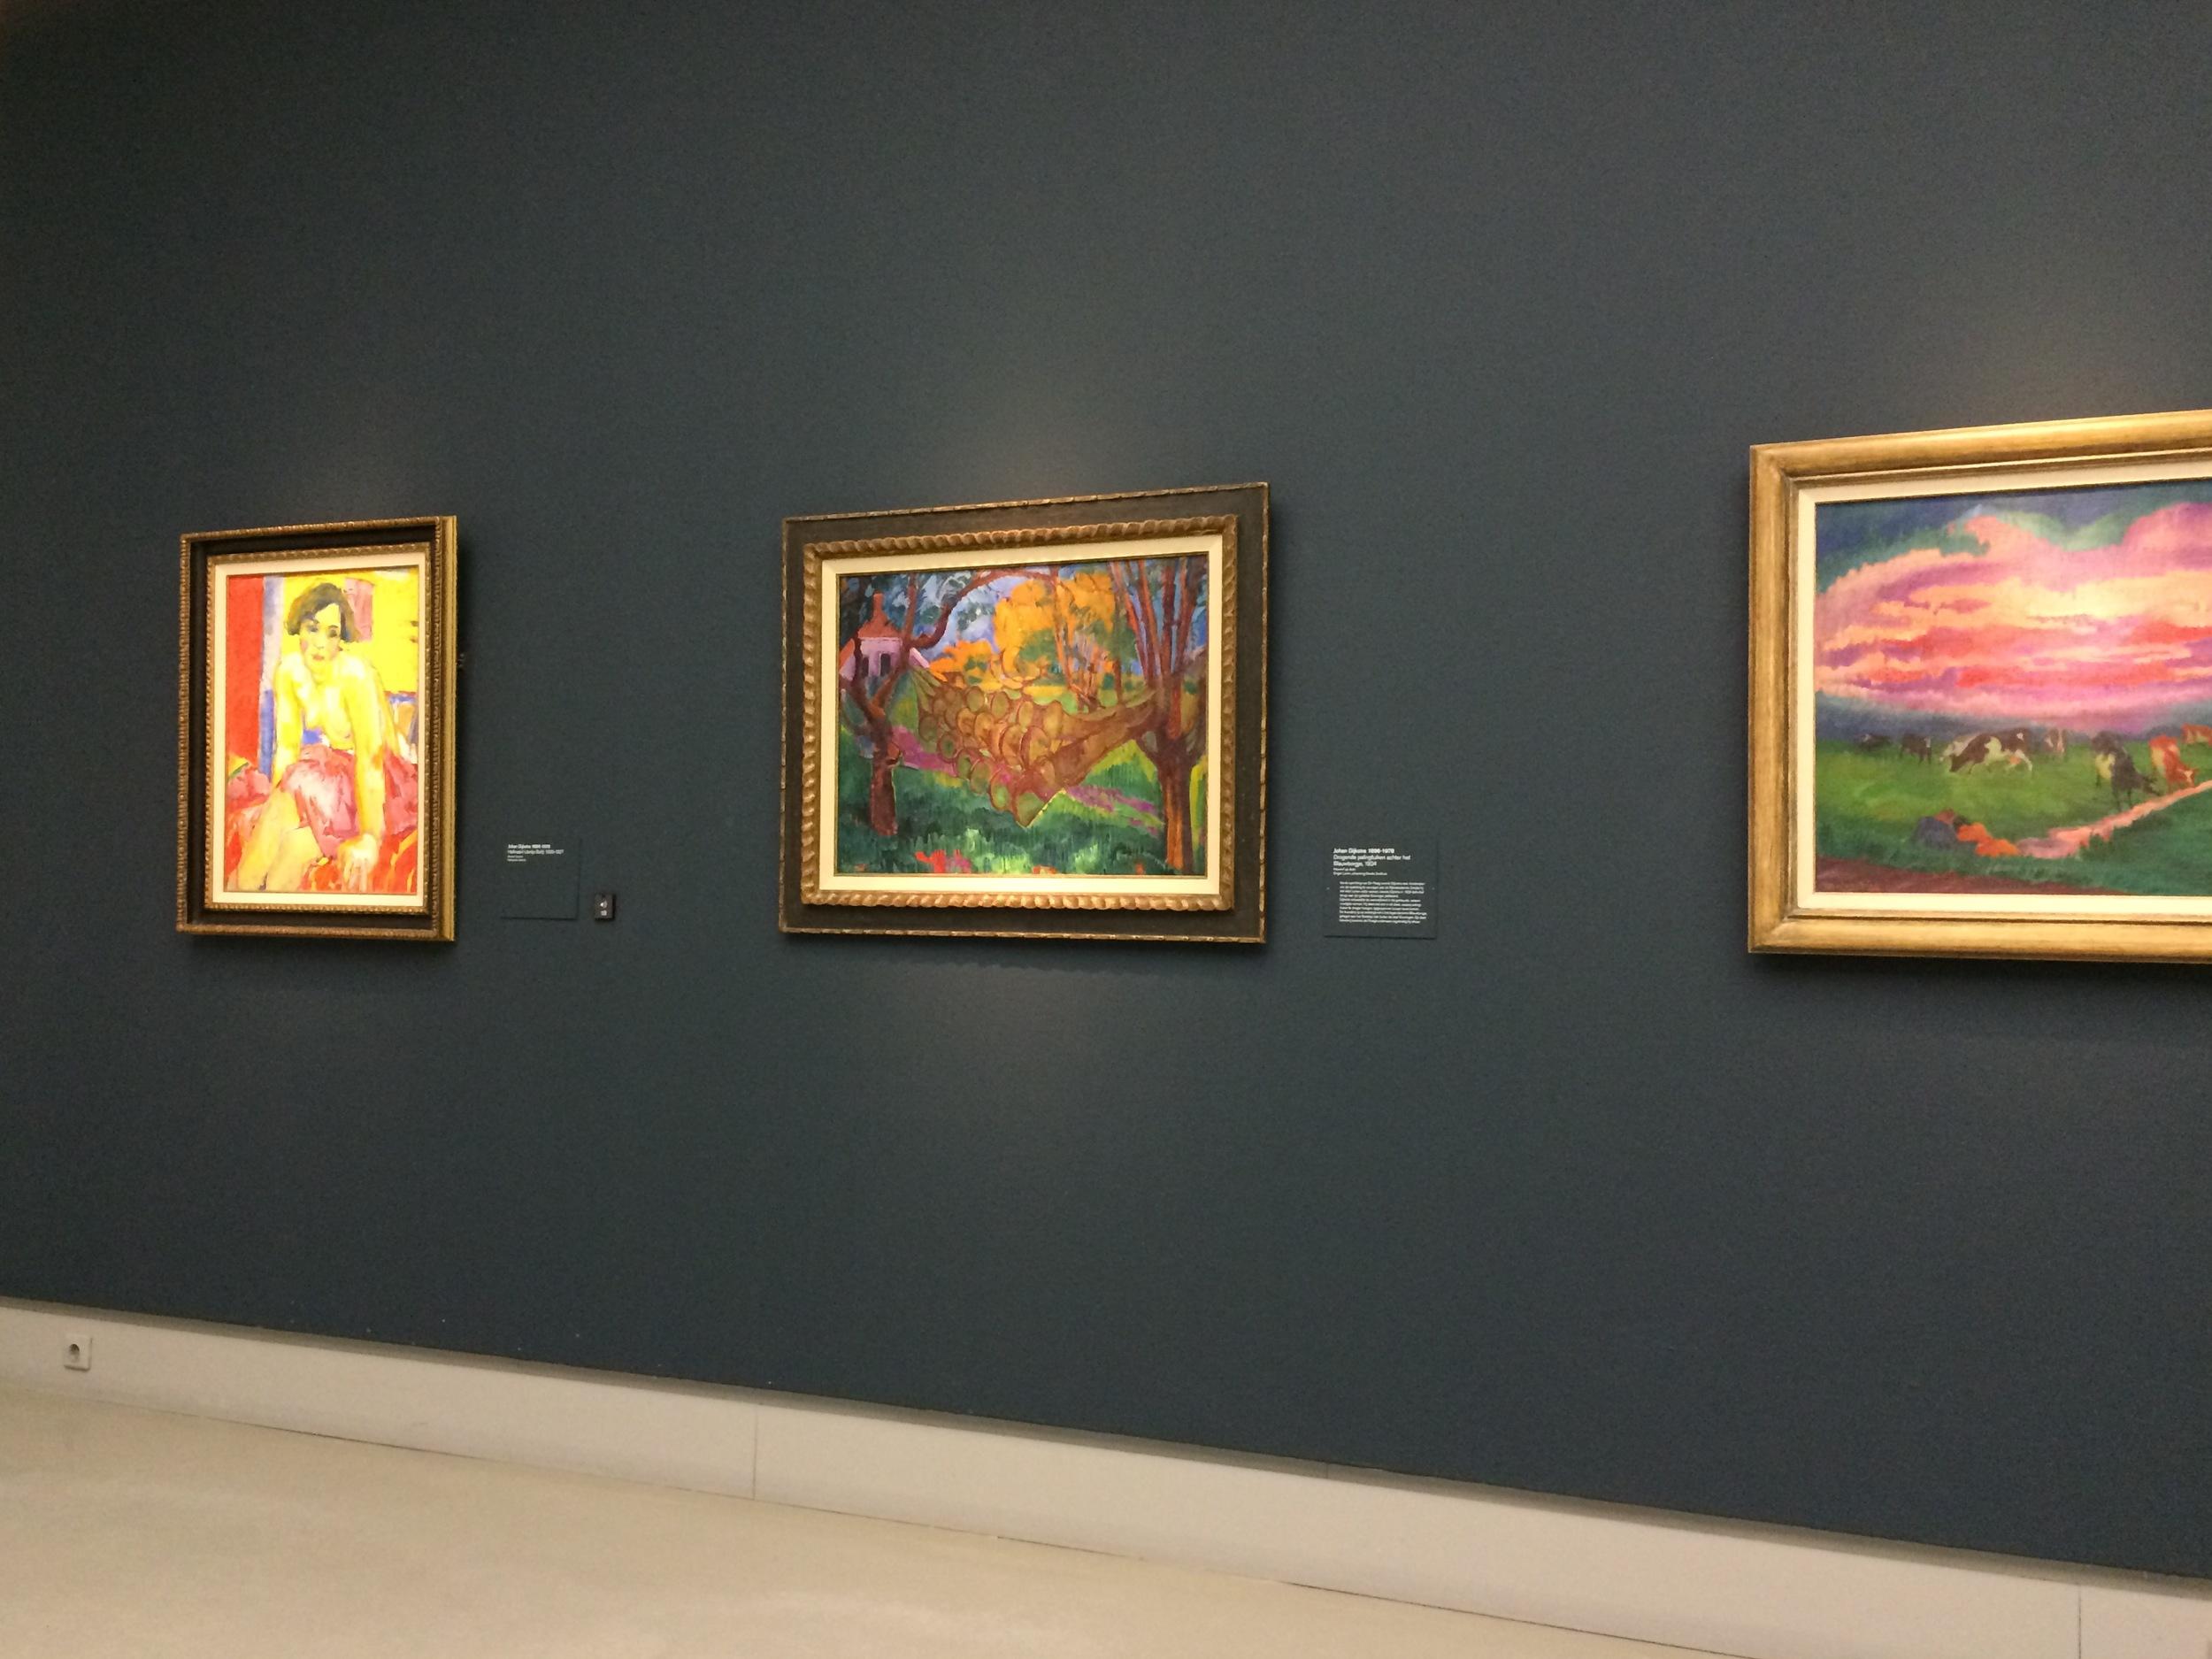 foto: De Museumpodcast